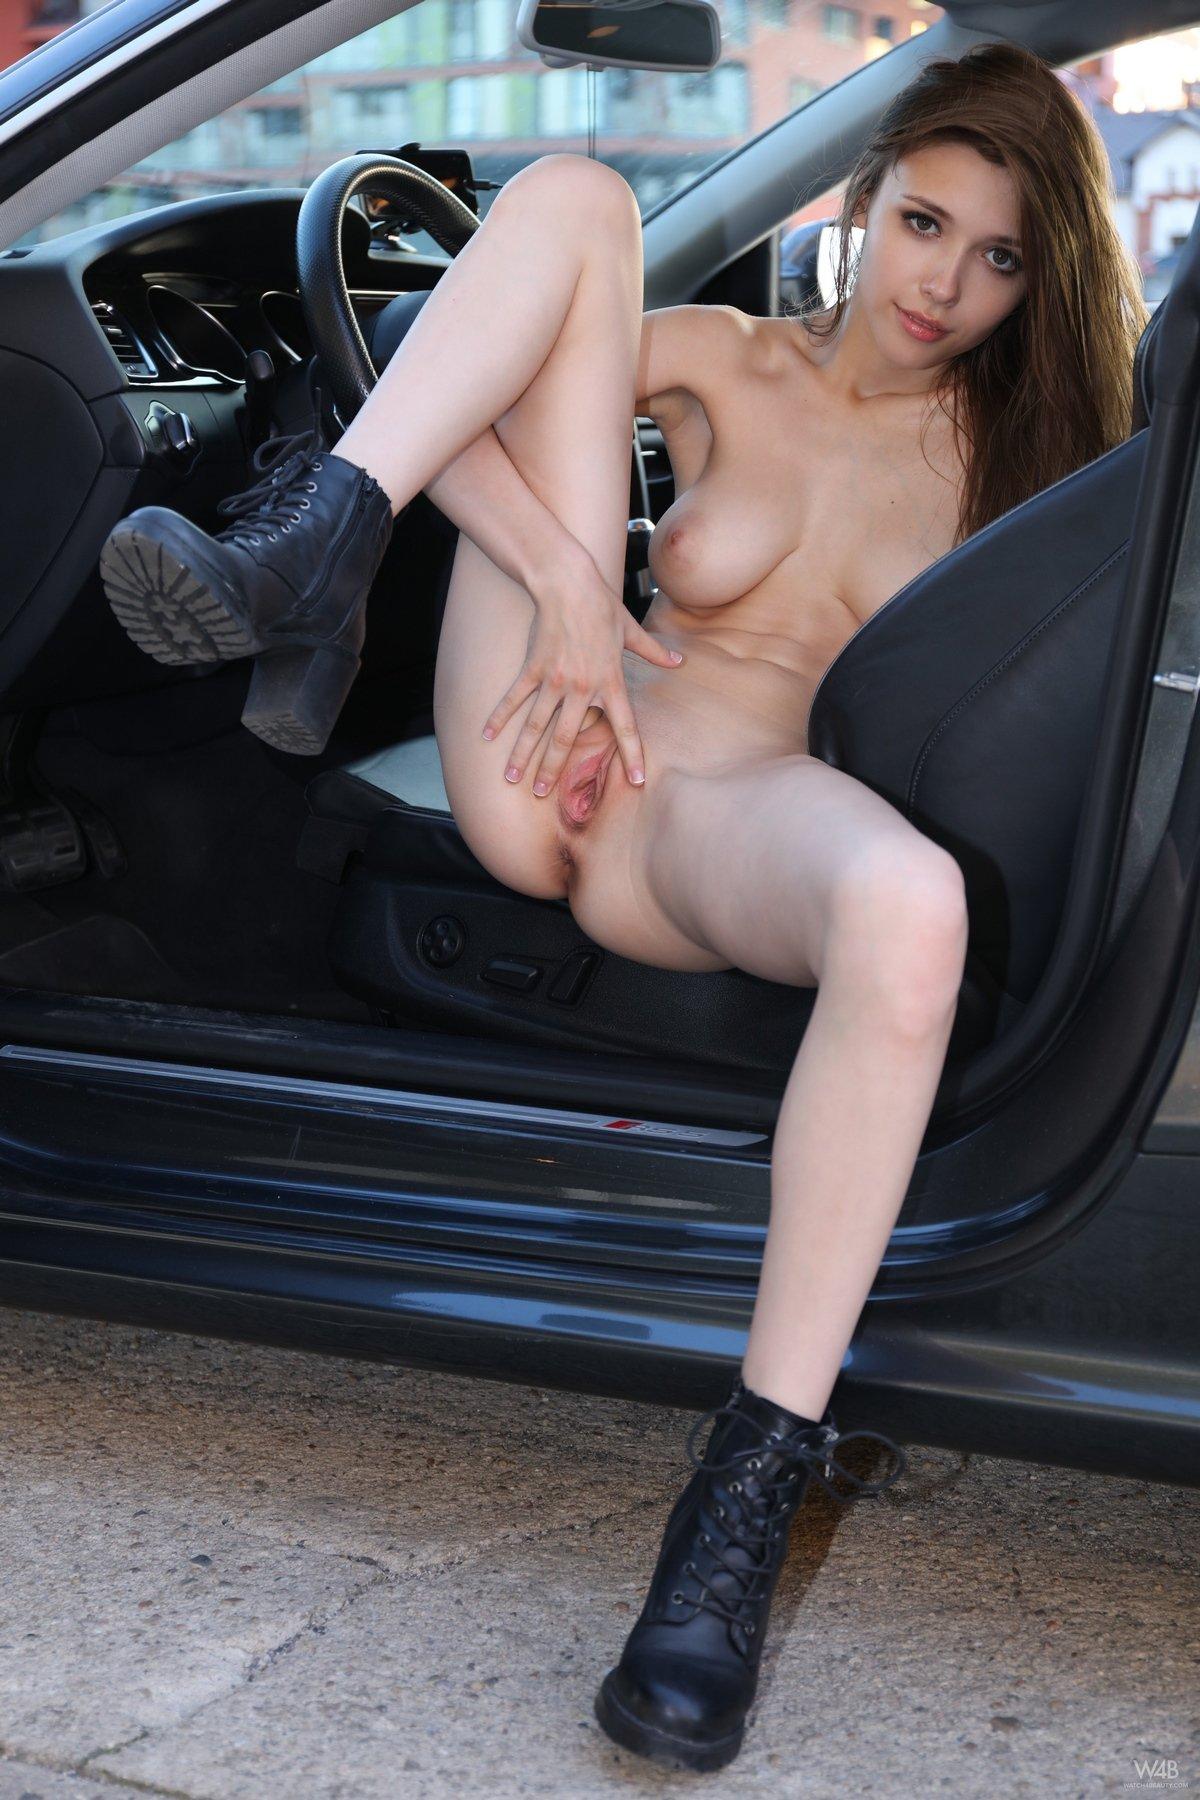 Девушка без трусиков в салоне авто